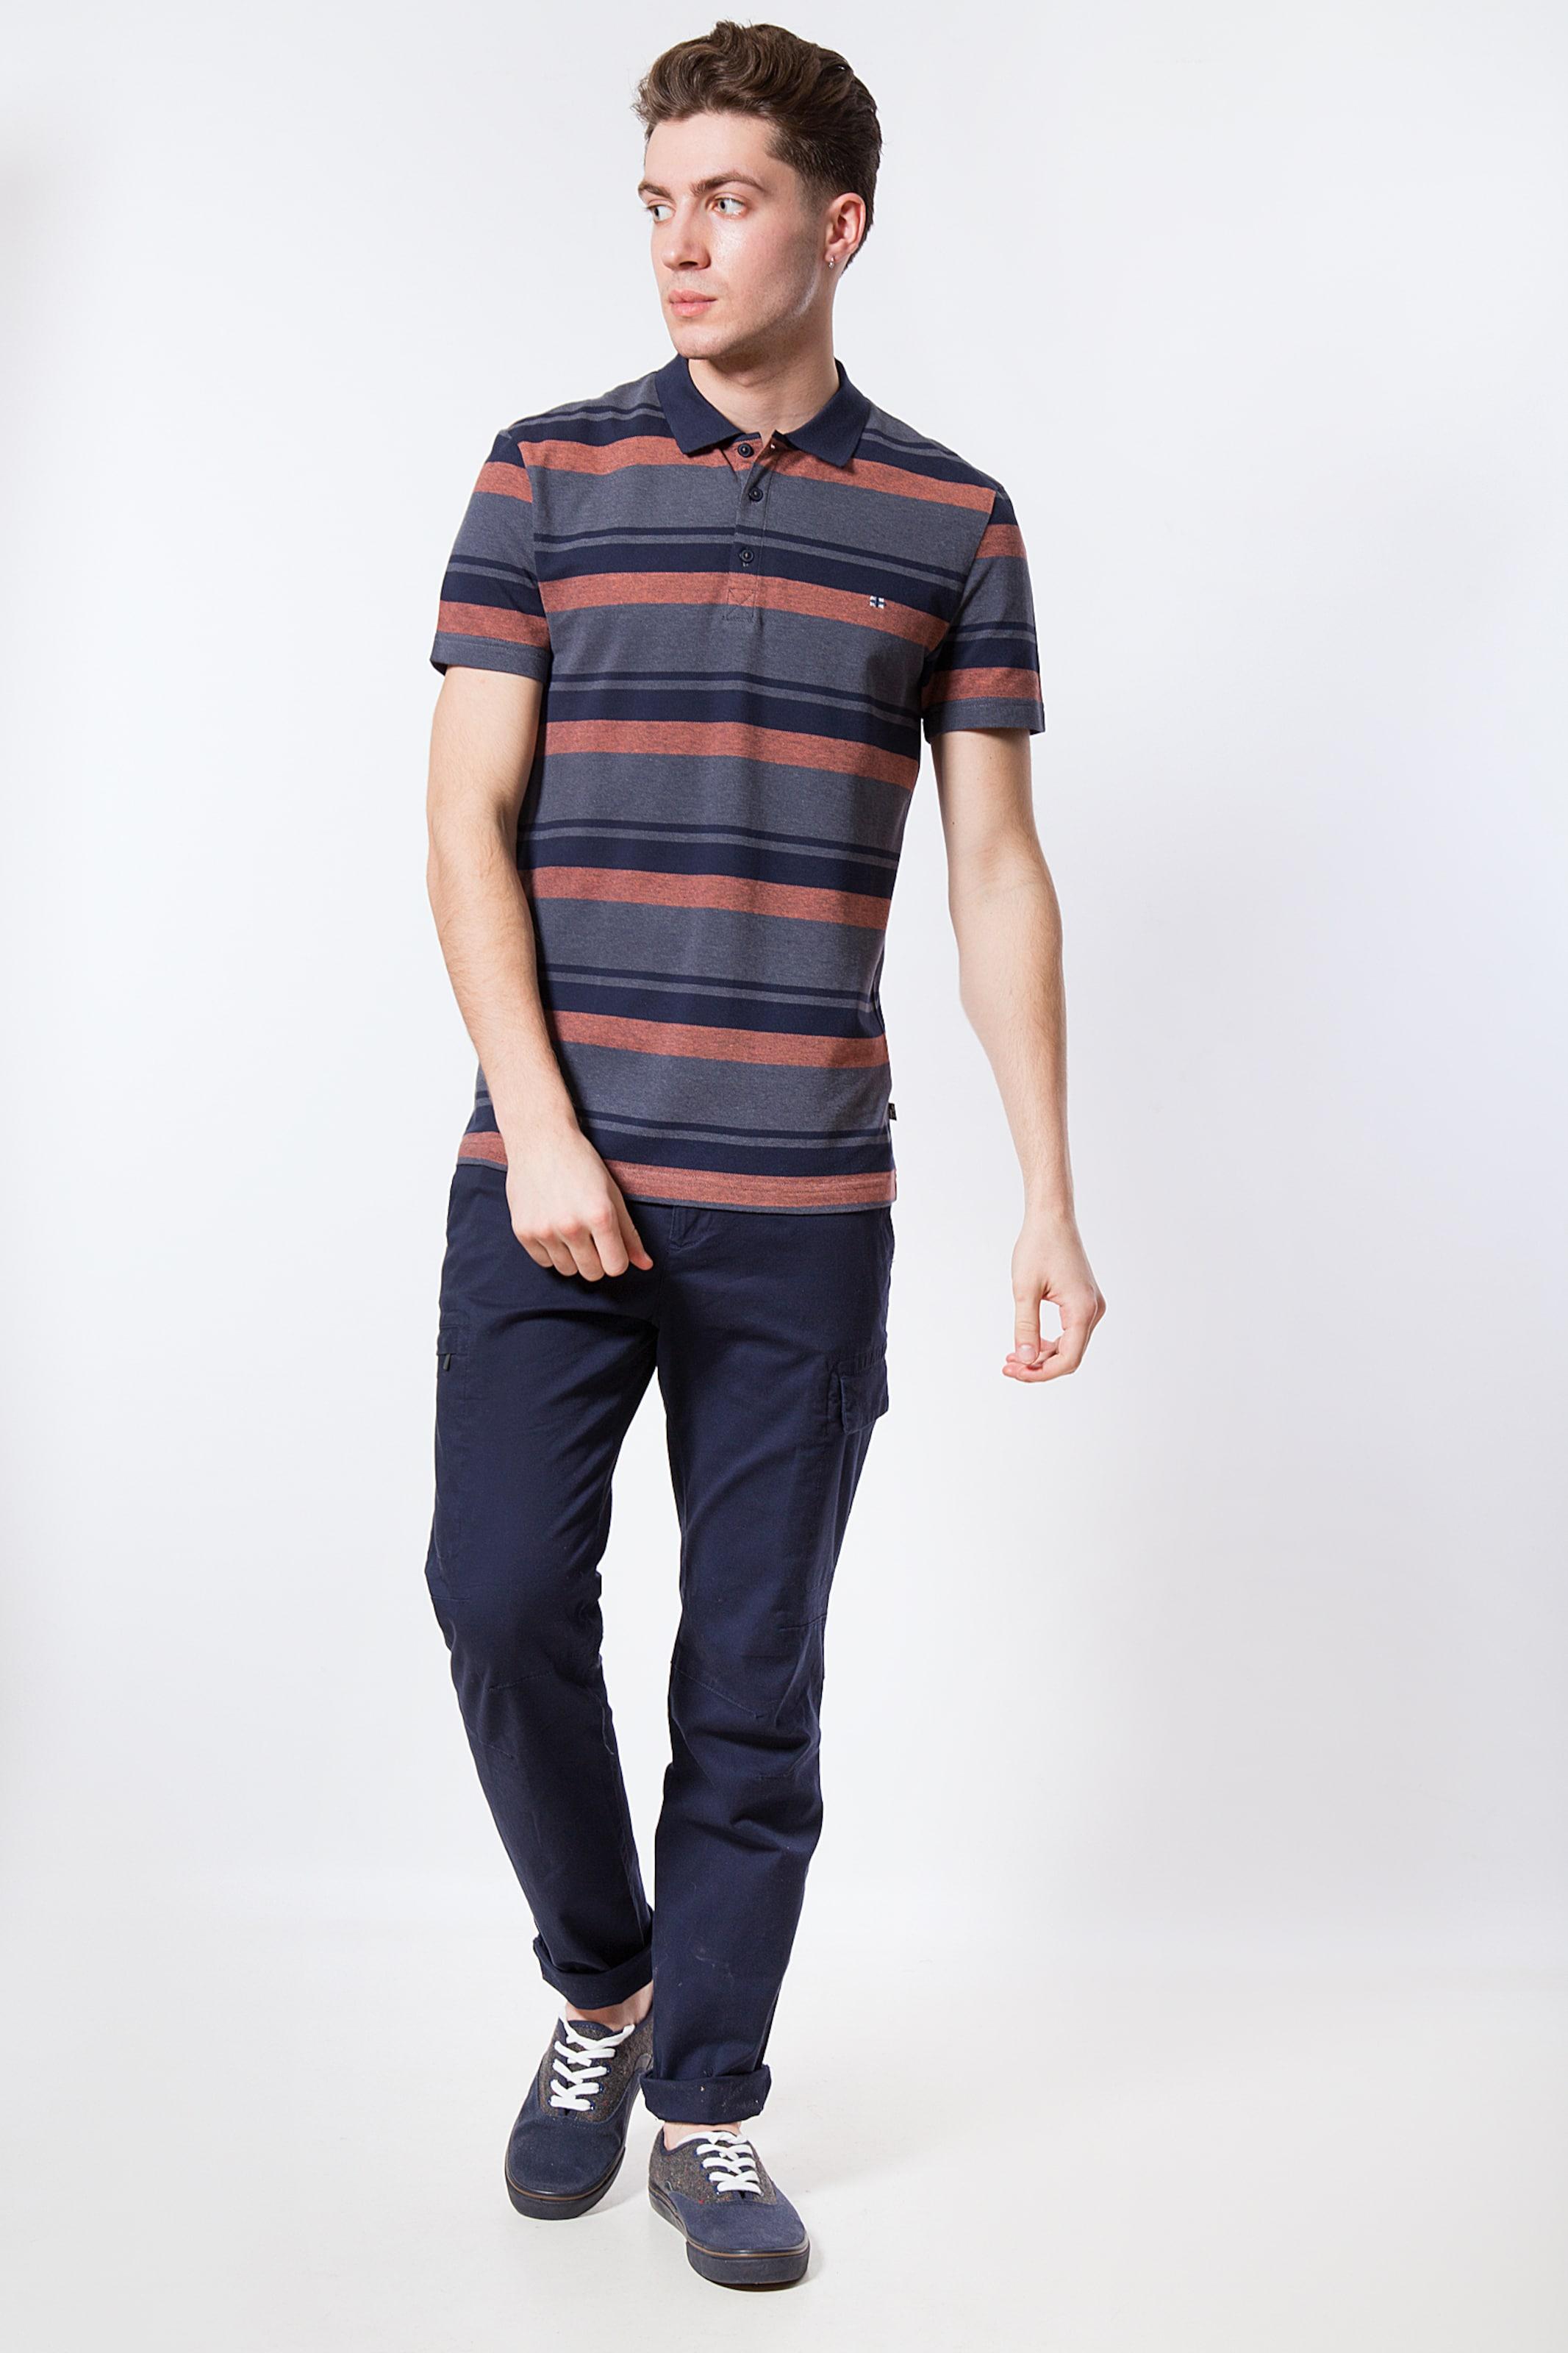 Flare ChamoisKobaltblau In Shirt Graphit Finn zpGLqSUMV